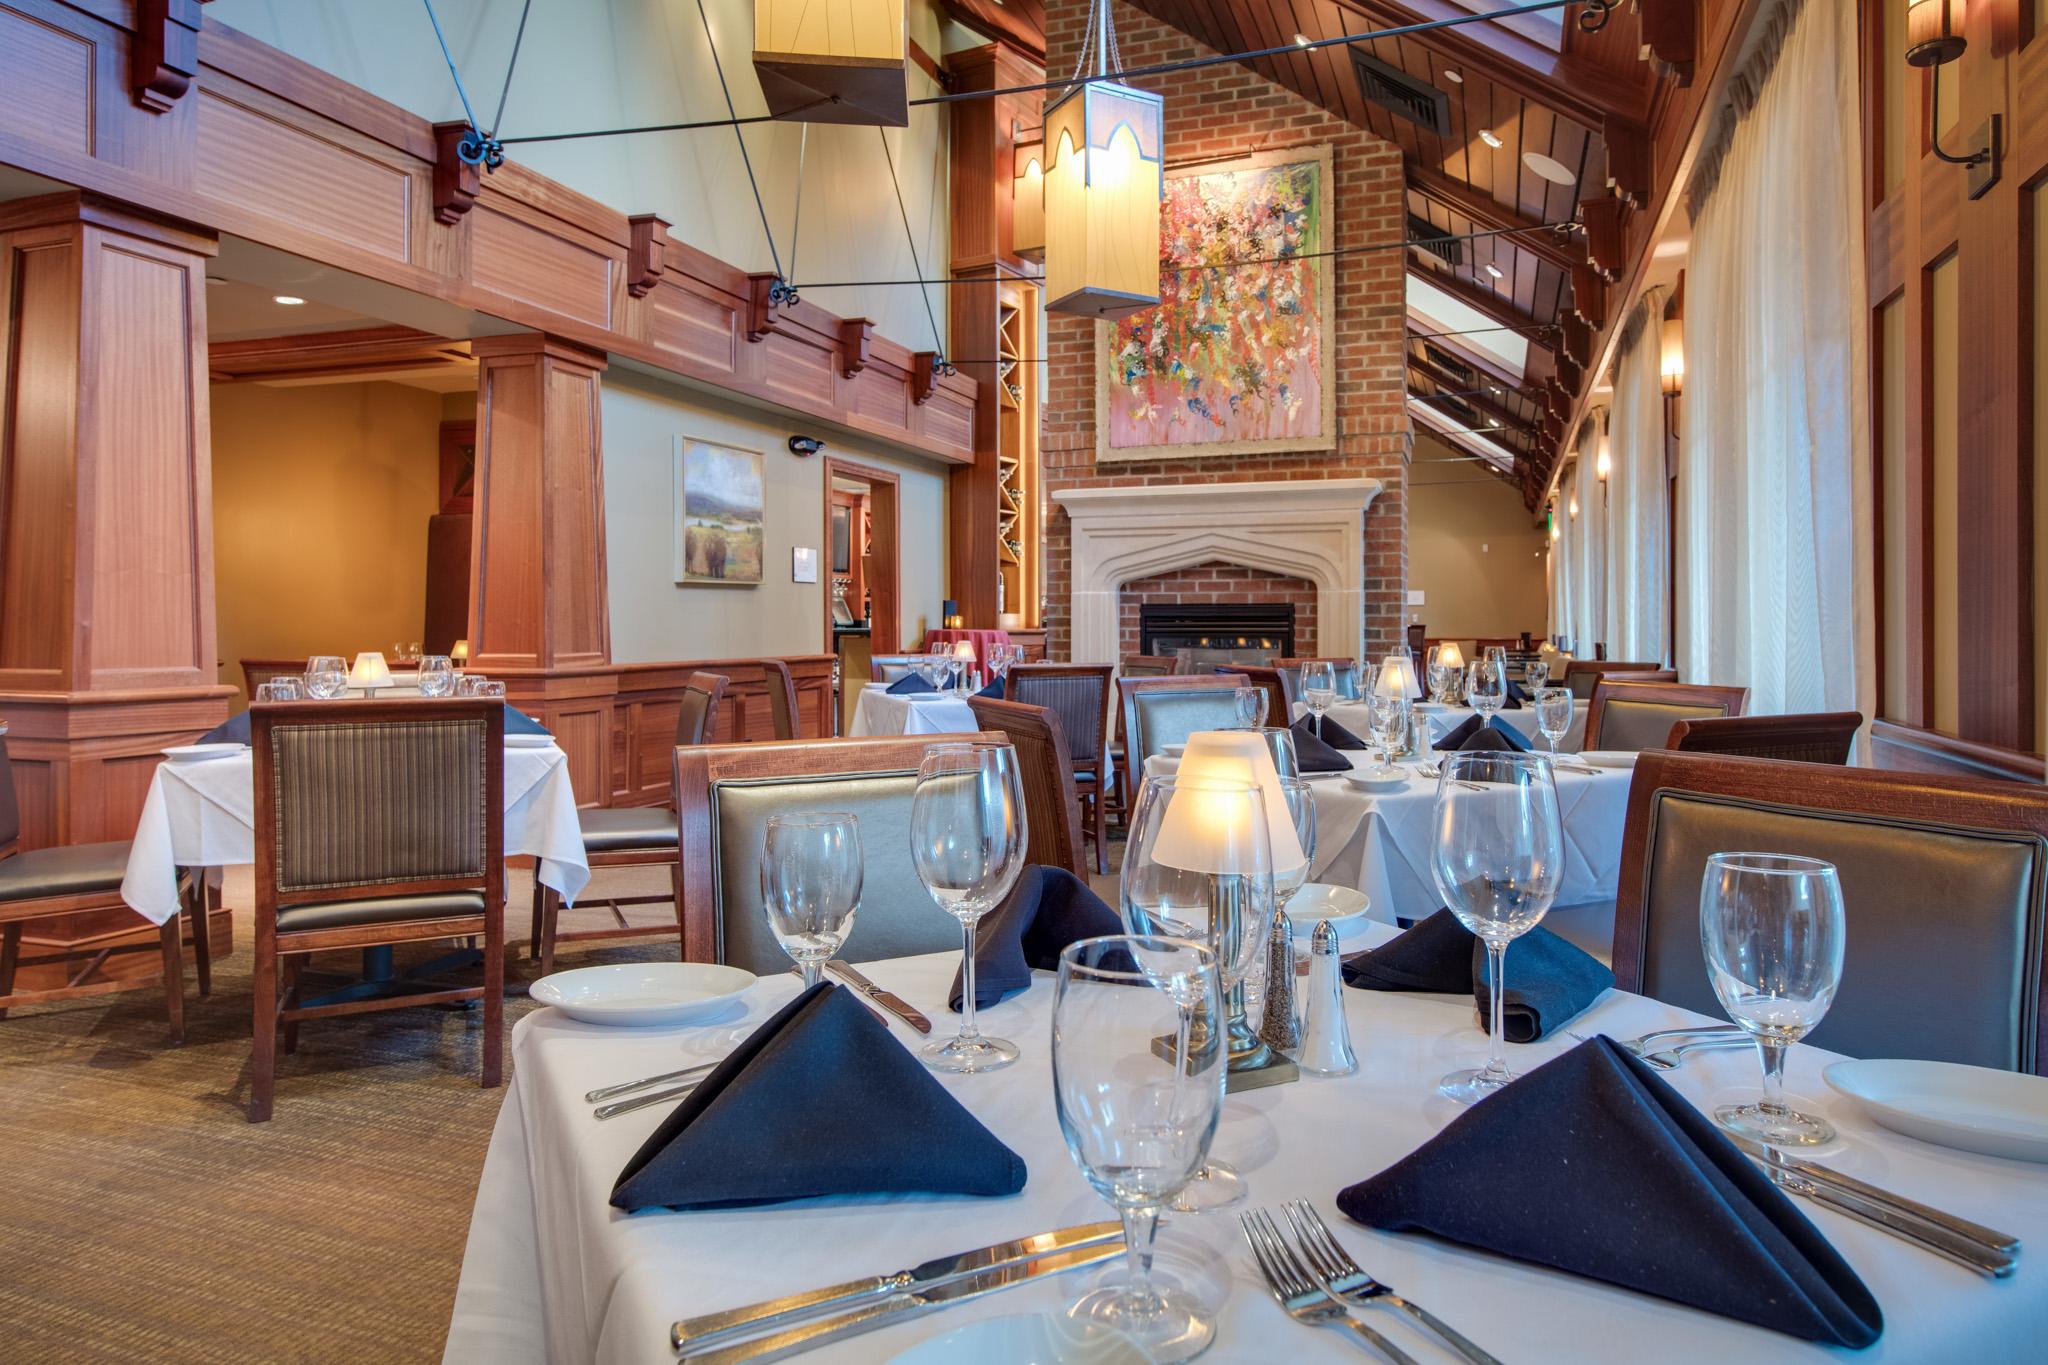 Ruth's Chris Steak House - Dining fireplace